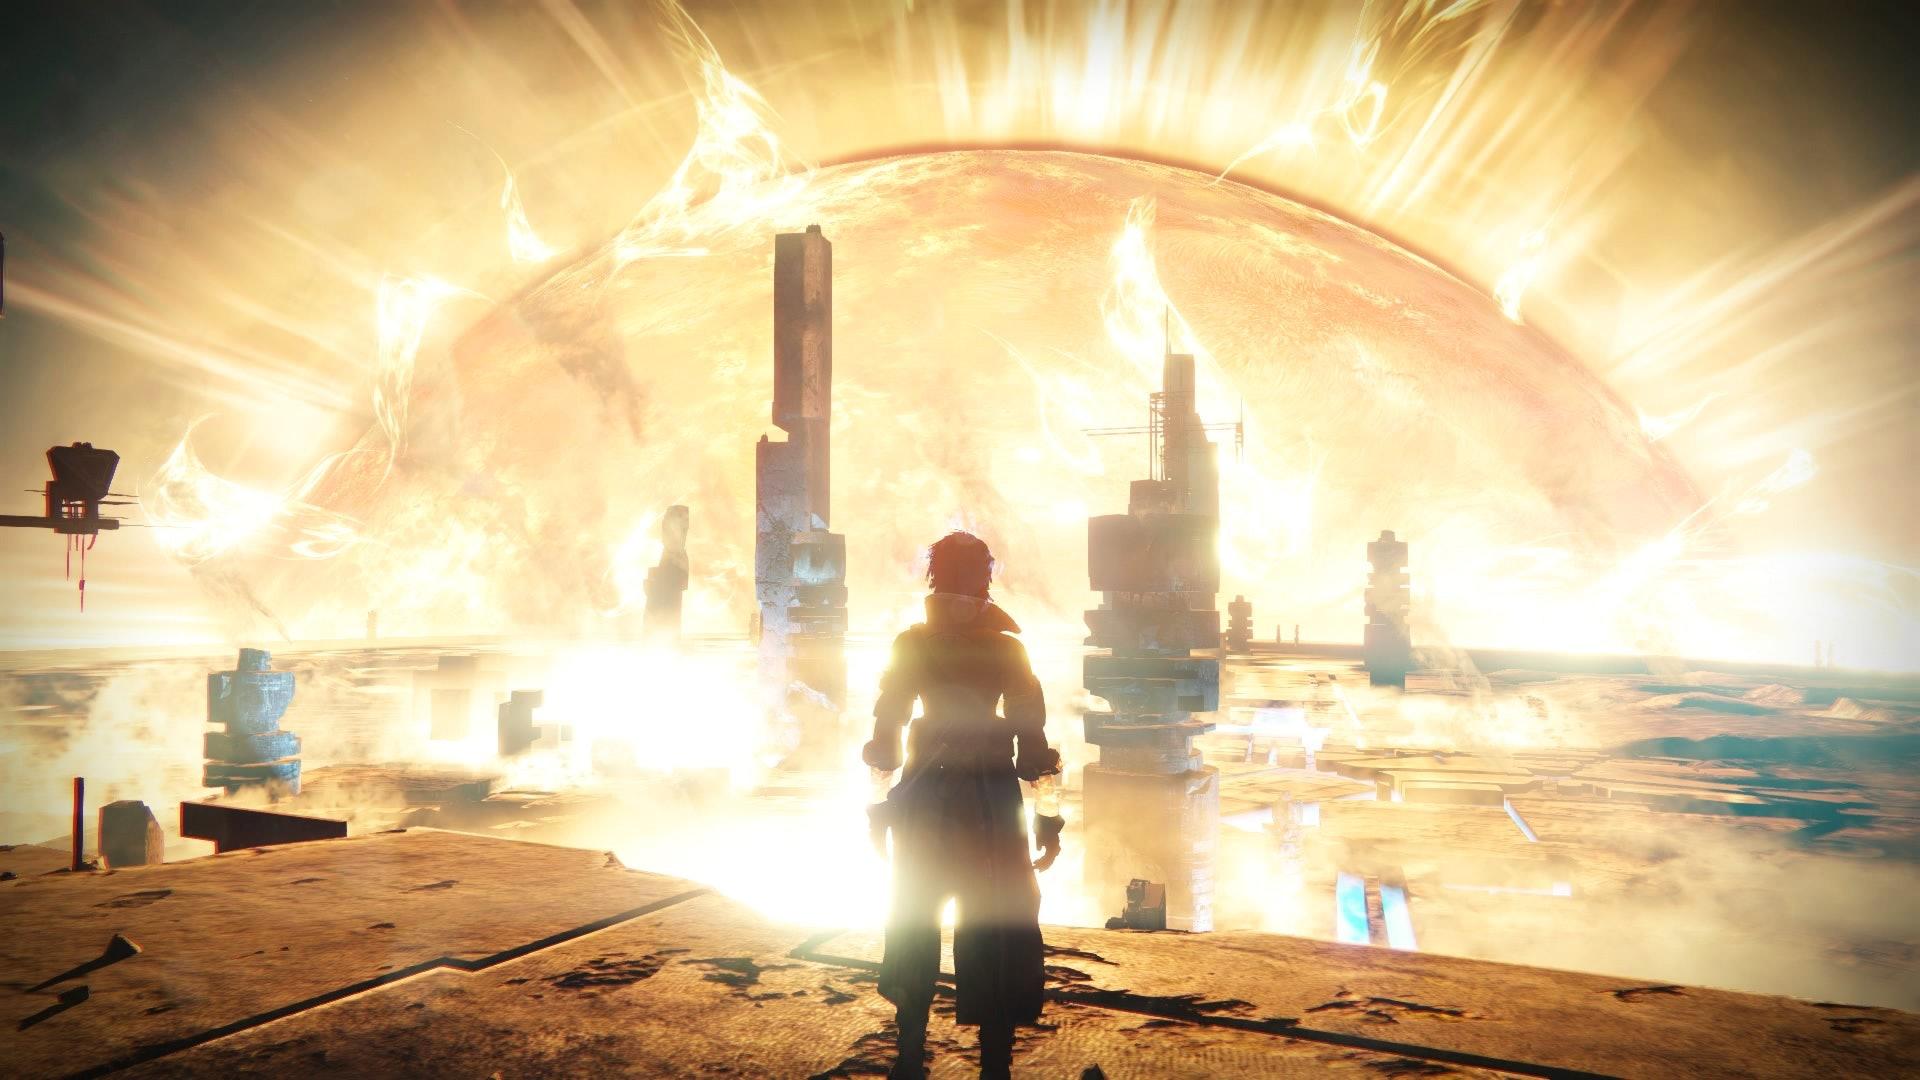 Destiny 2 Trials Of Osiris Season 10 Brings Back One Of The Best